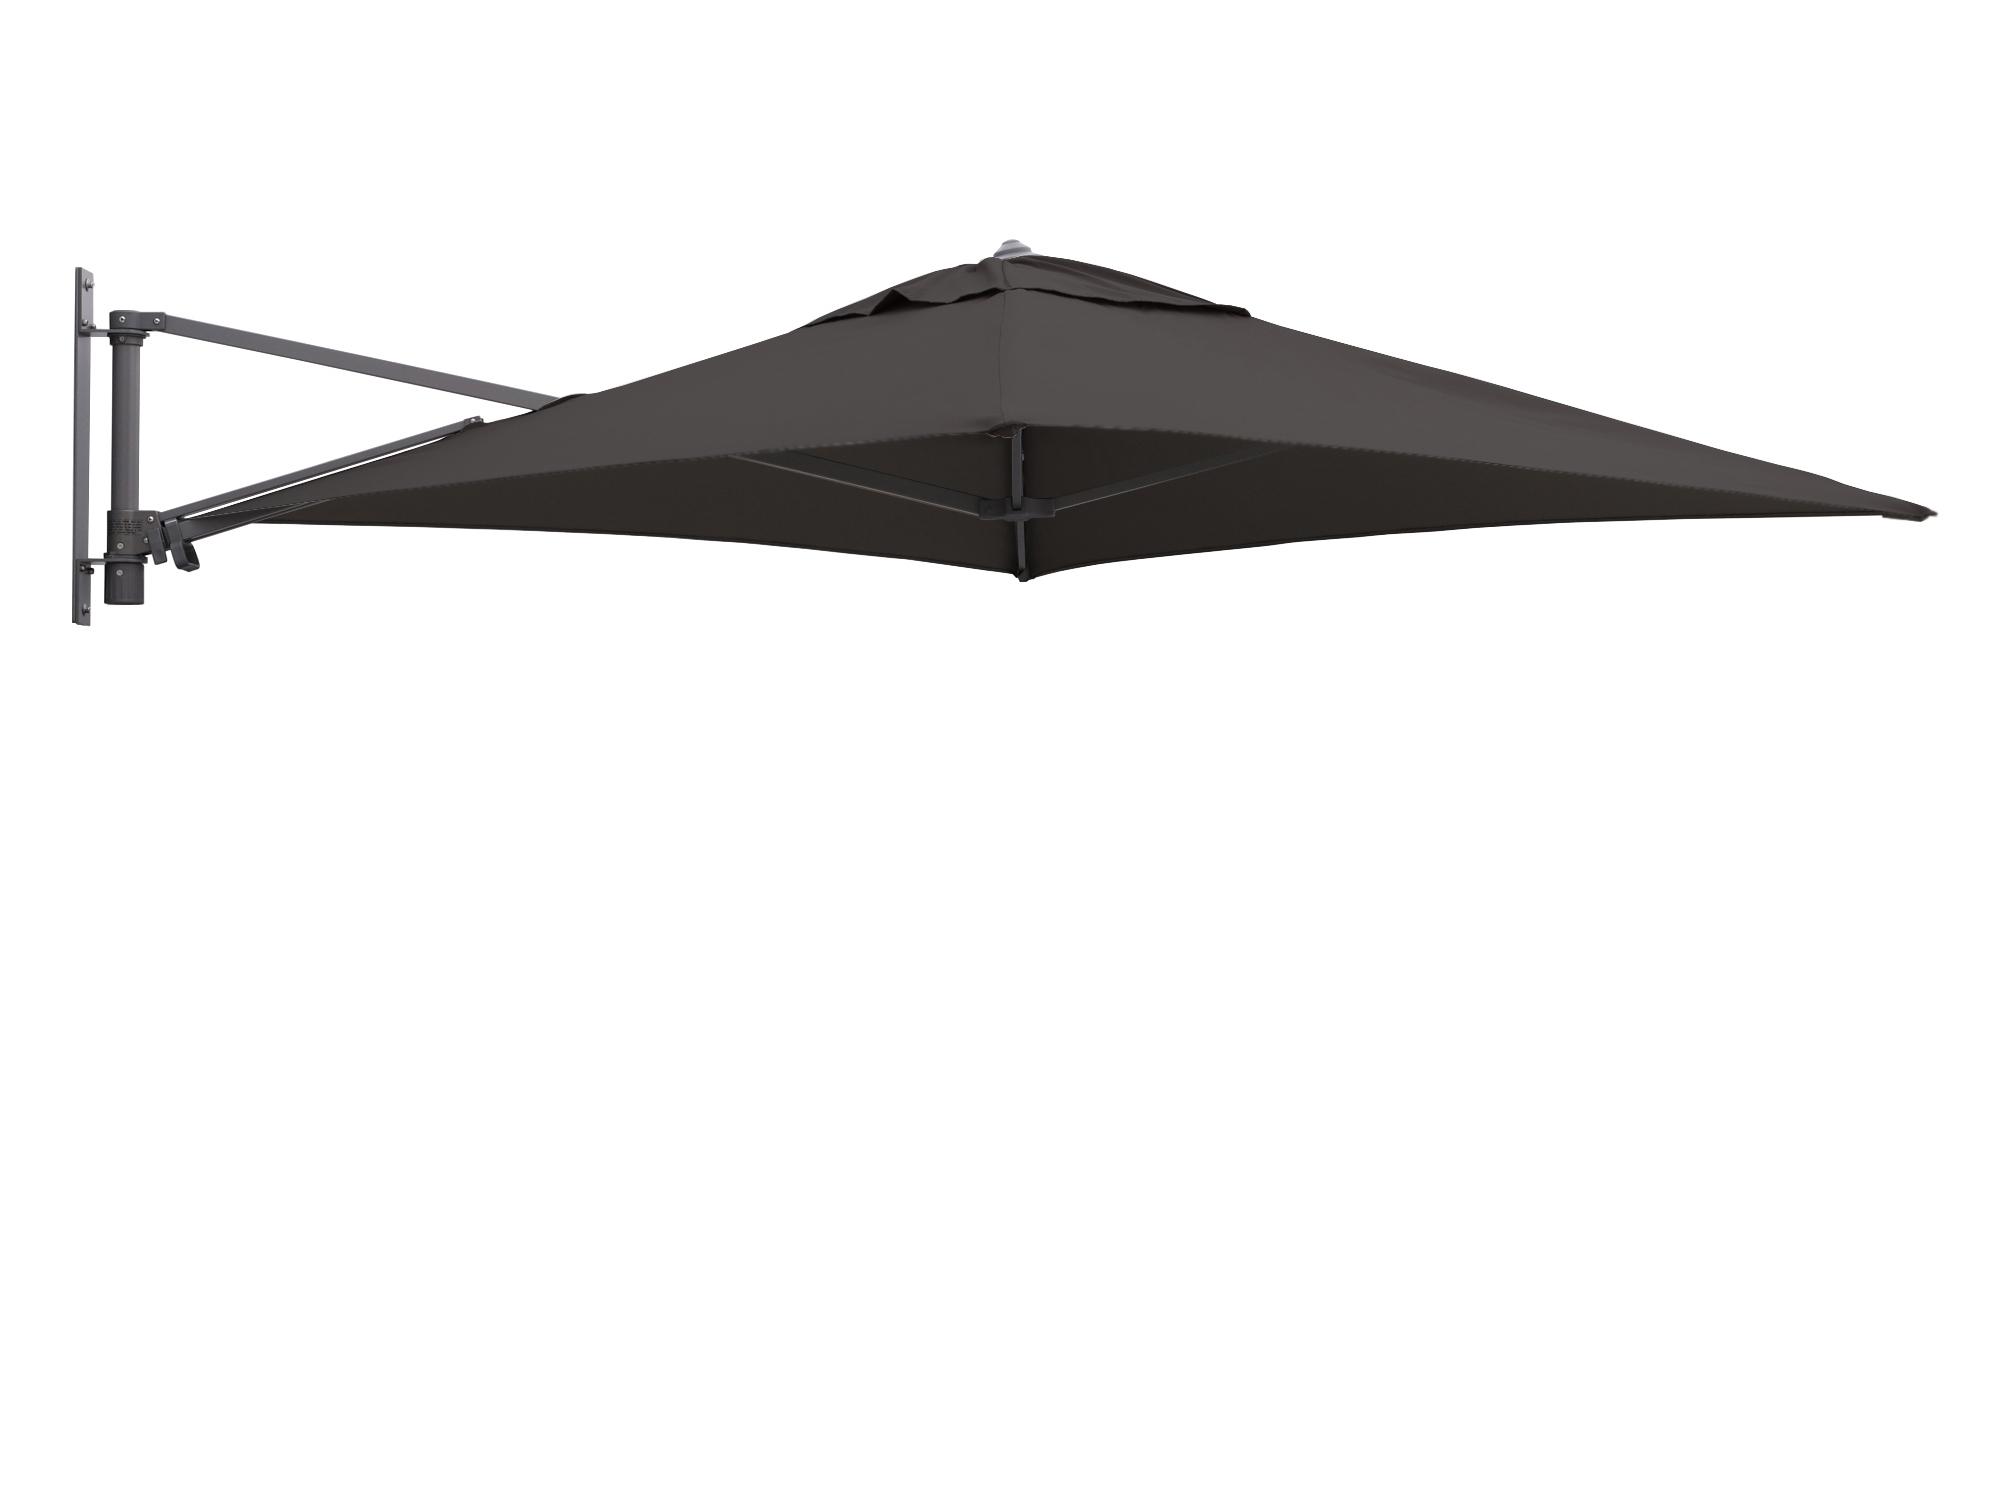 Shadowline muurparasol 200x200cm - Laagste prijsgarantie!